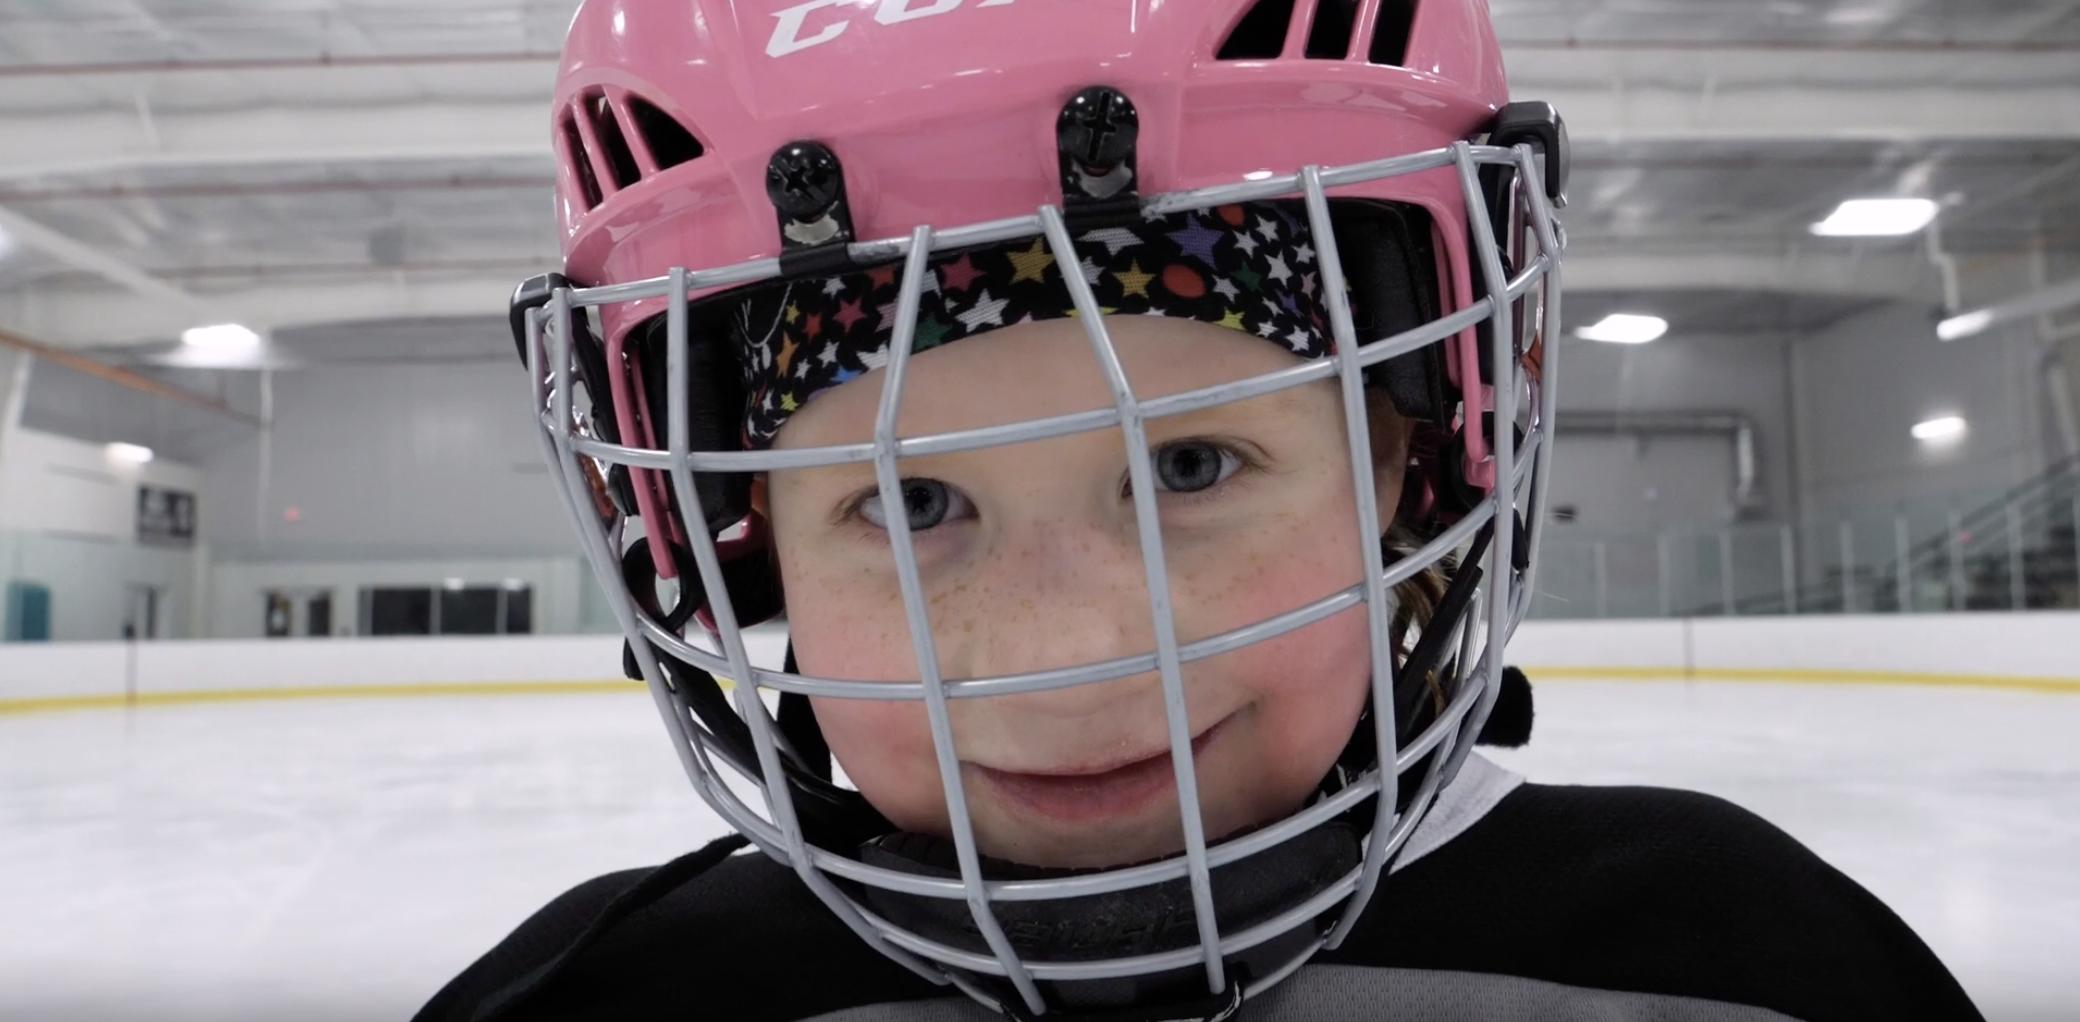 Edmonton Girls Hockey Association - Brand Video